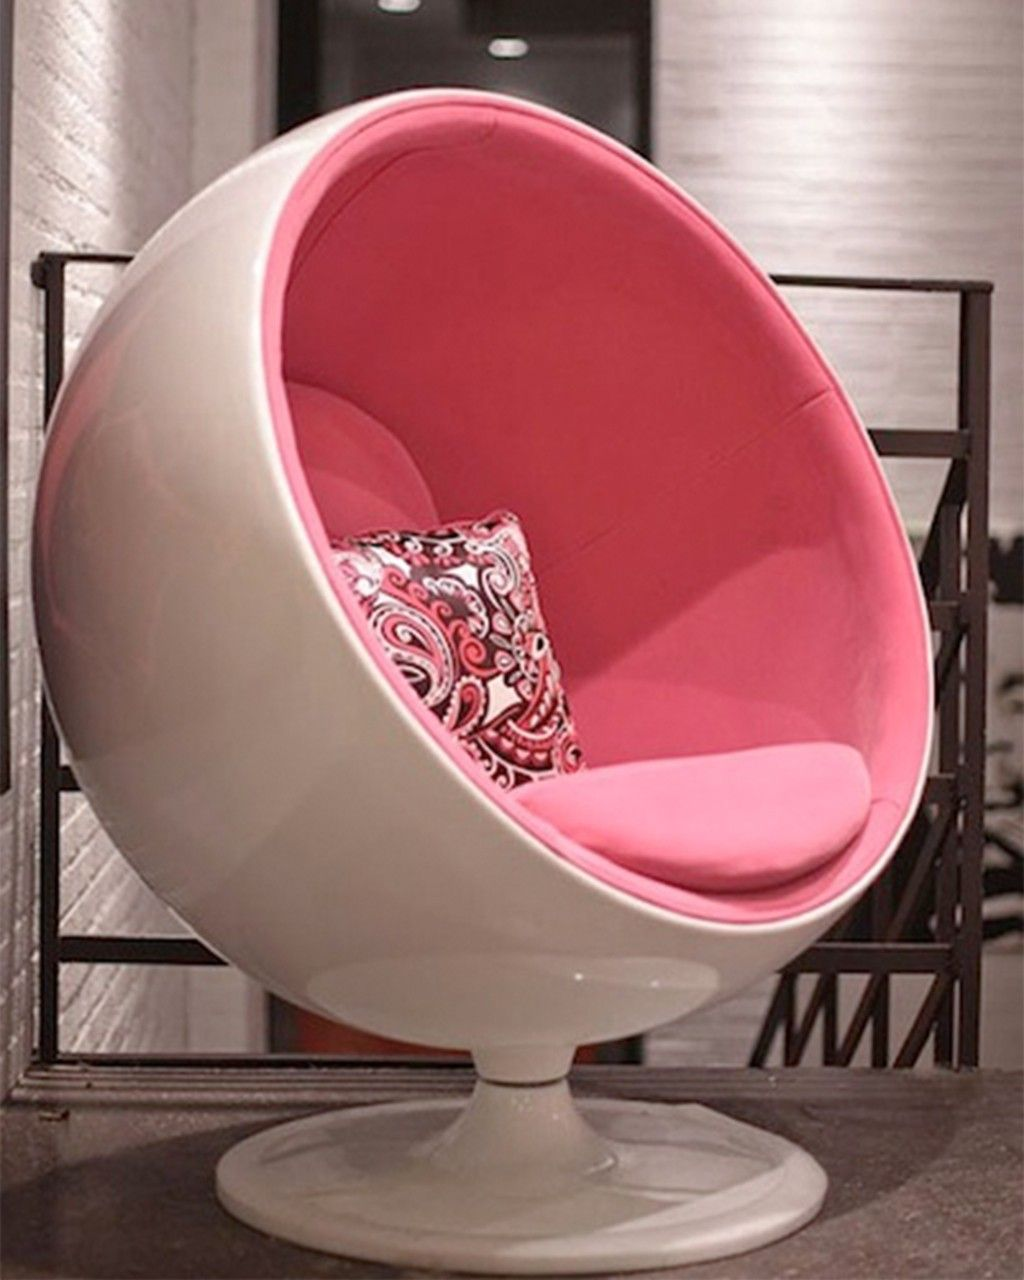 Christmas Girl Pink Room Teen Room Ideas 2013 Girl Pink Room Teen Room Ideas 2013 Interiors Teen Sofa Chairs furniture Teen Sofa Chair